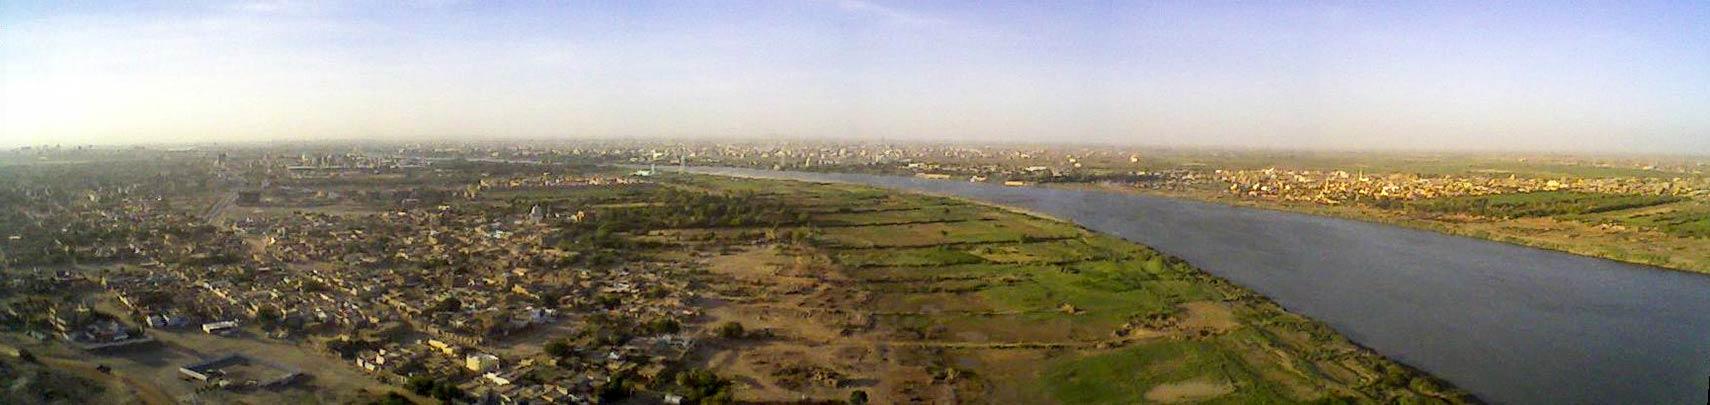 Google Map of Khartoum, Sudan - Nations Online Project on damascus road map, prague road map, lagos road map, kathmandu road map, santo domingo road map, karachi road map, francistown road map, addis ababa road map, south sudan road map, dar es salaam road map, nairobi road map, havana road map, alexandria road map, manzini road map, muscat road map, baghdad road map, moscow road map, africa road map, islamabad road map, madrid road map,